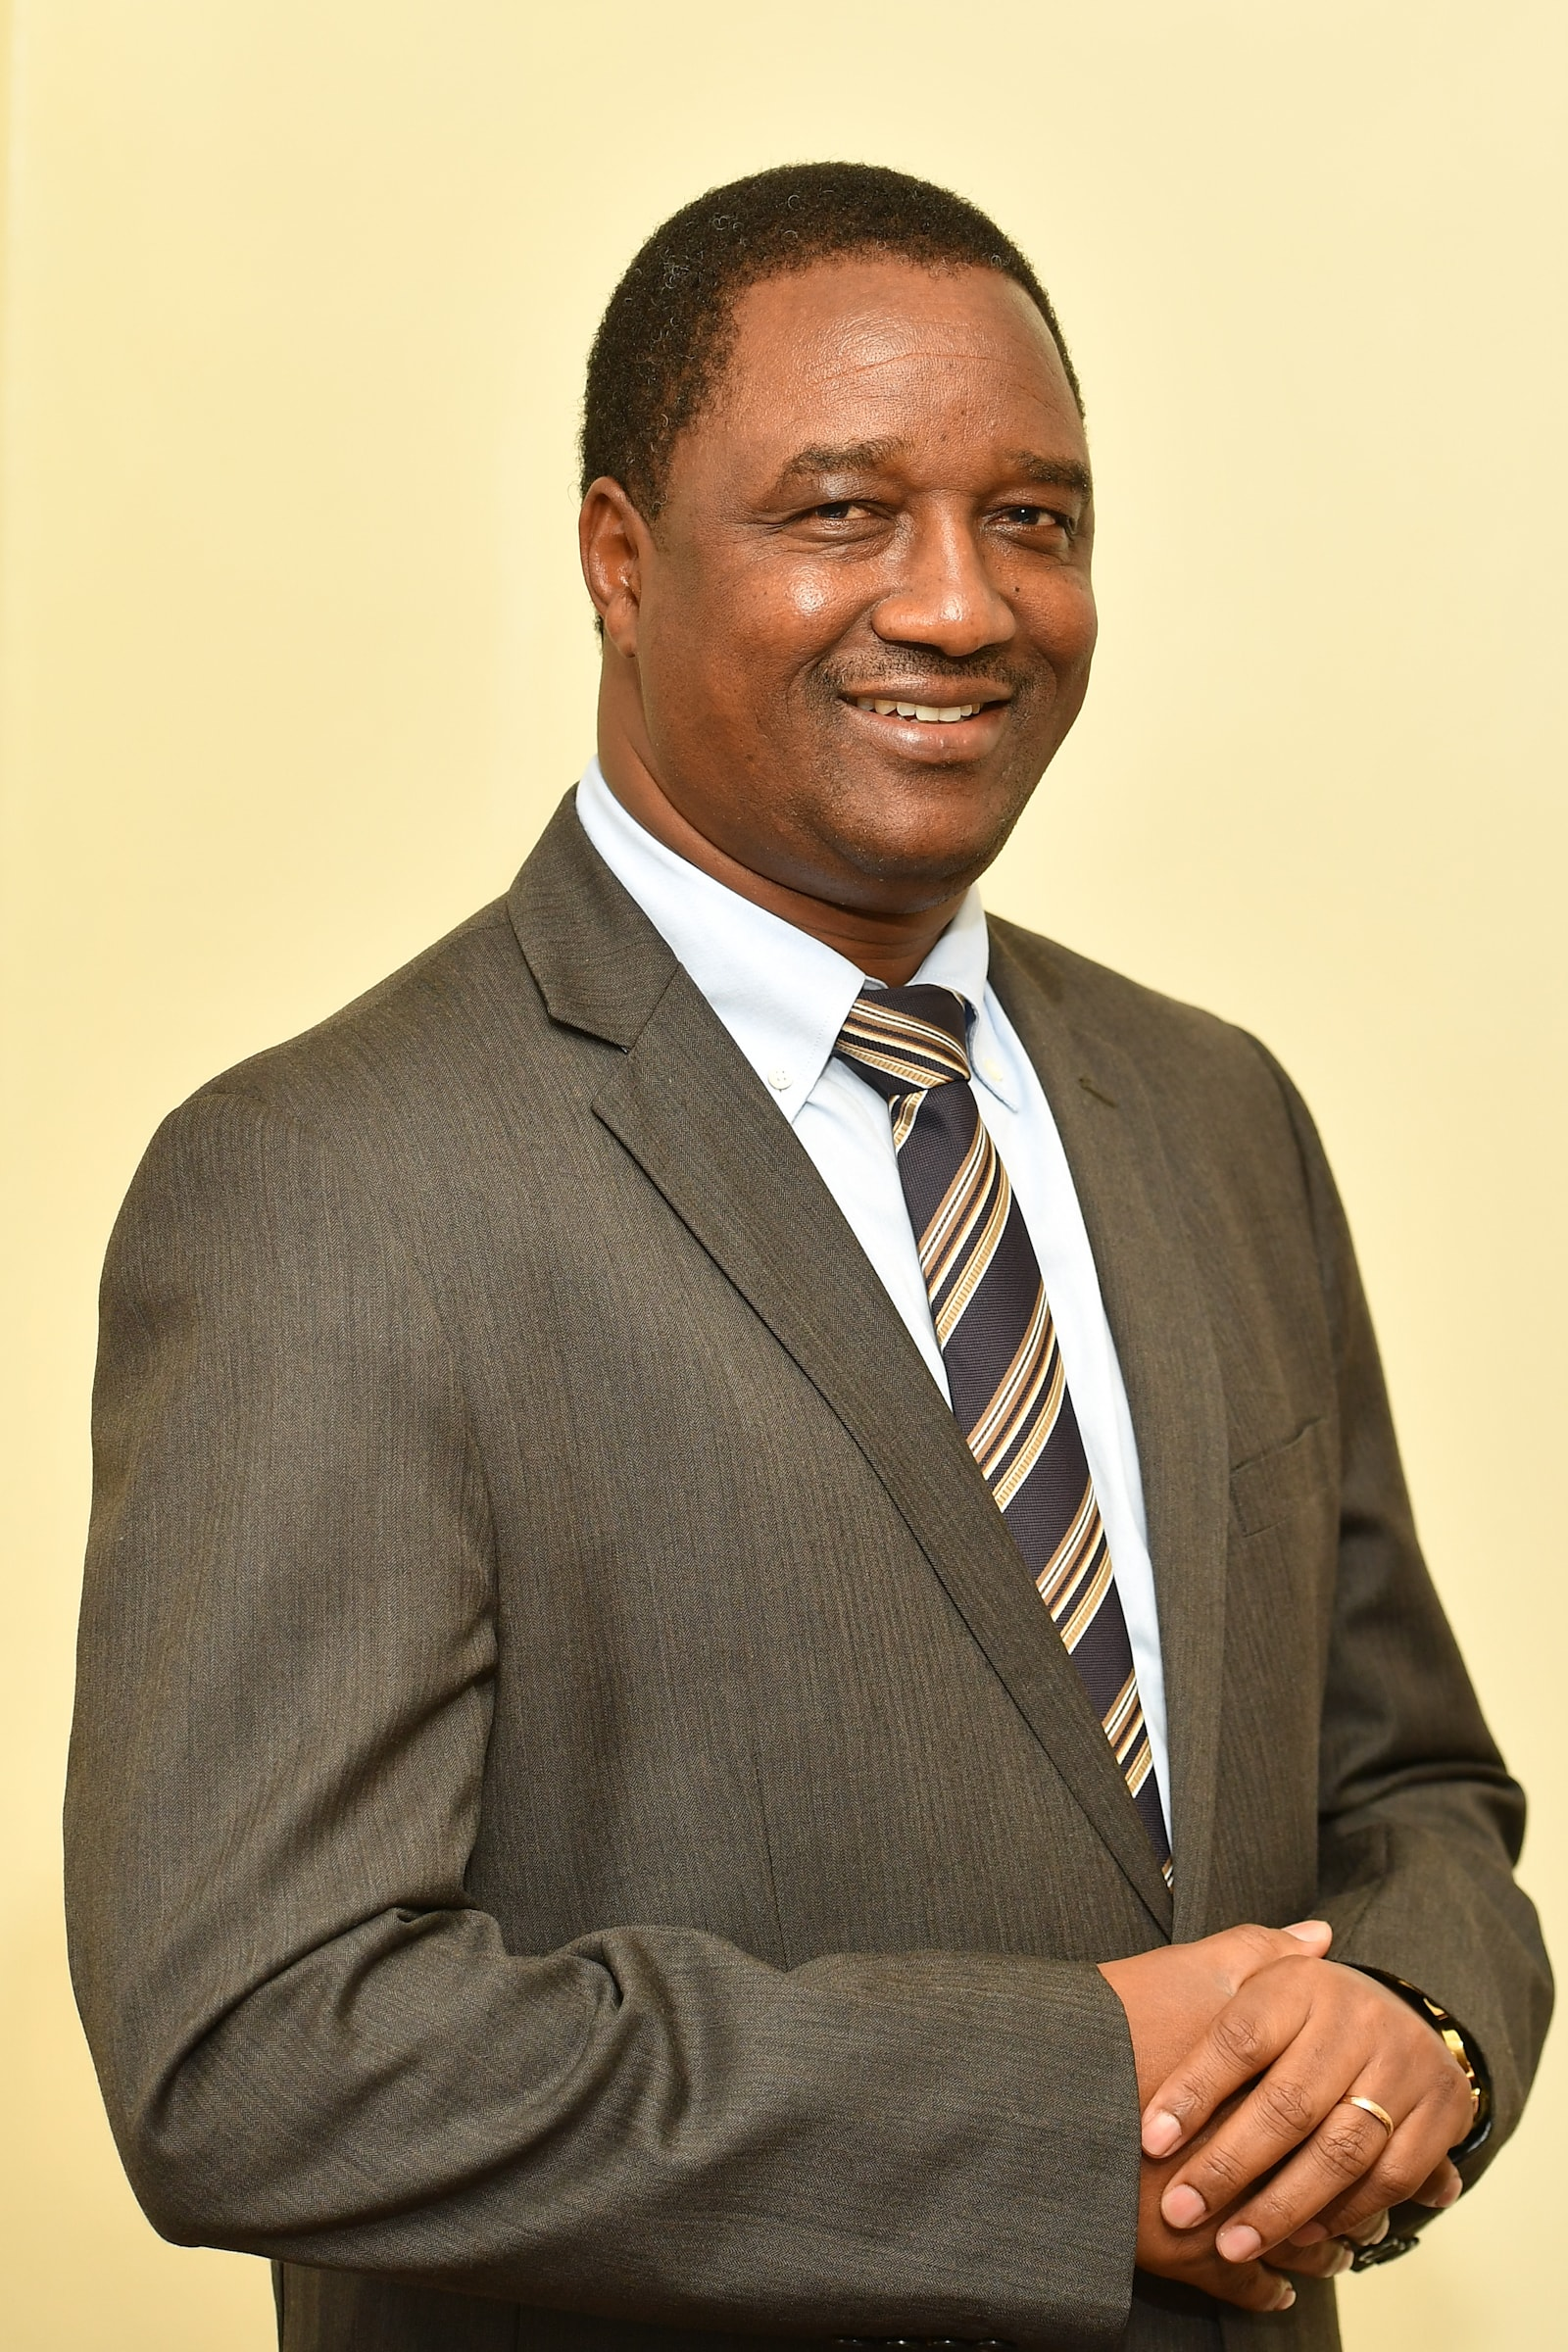 Adviser Directory 投资肯尼亚 商业肯尼亚 投资非洲 Kenya Keninvest